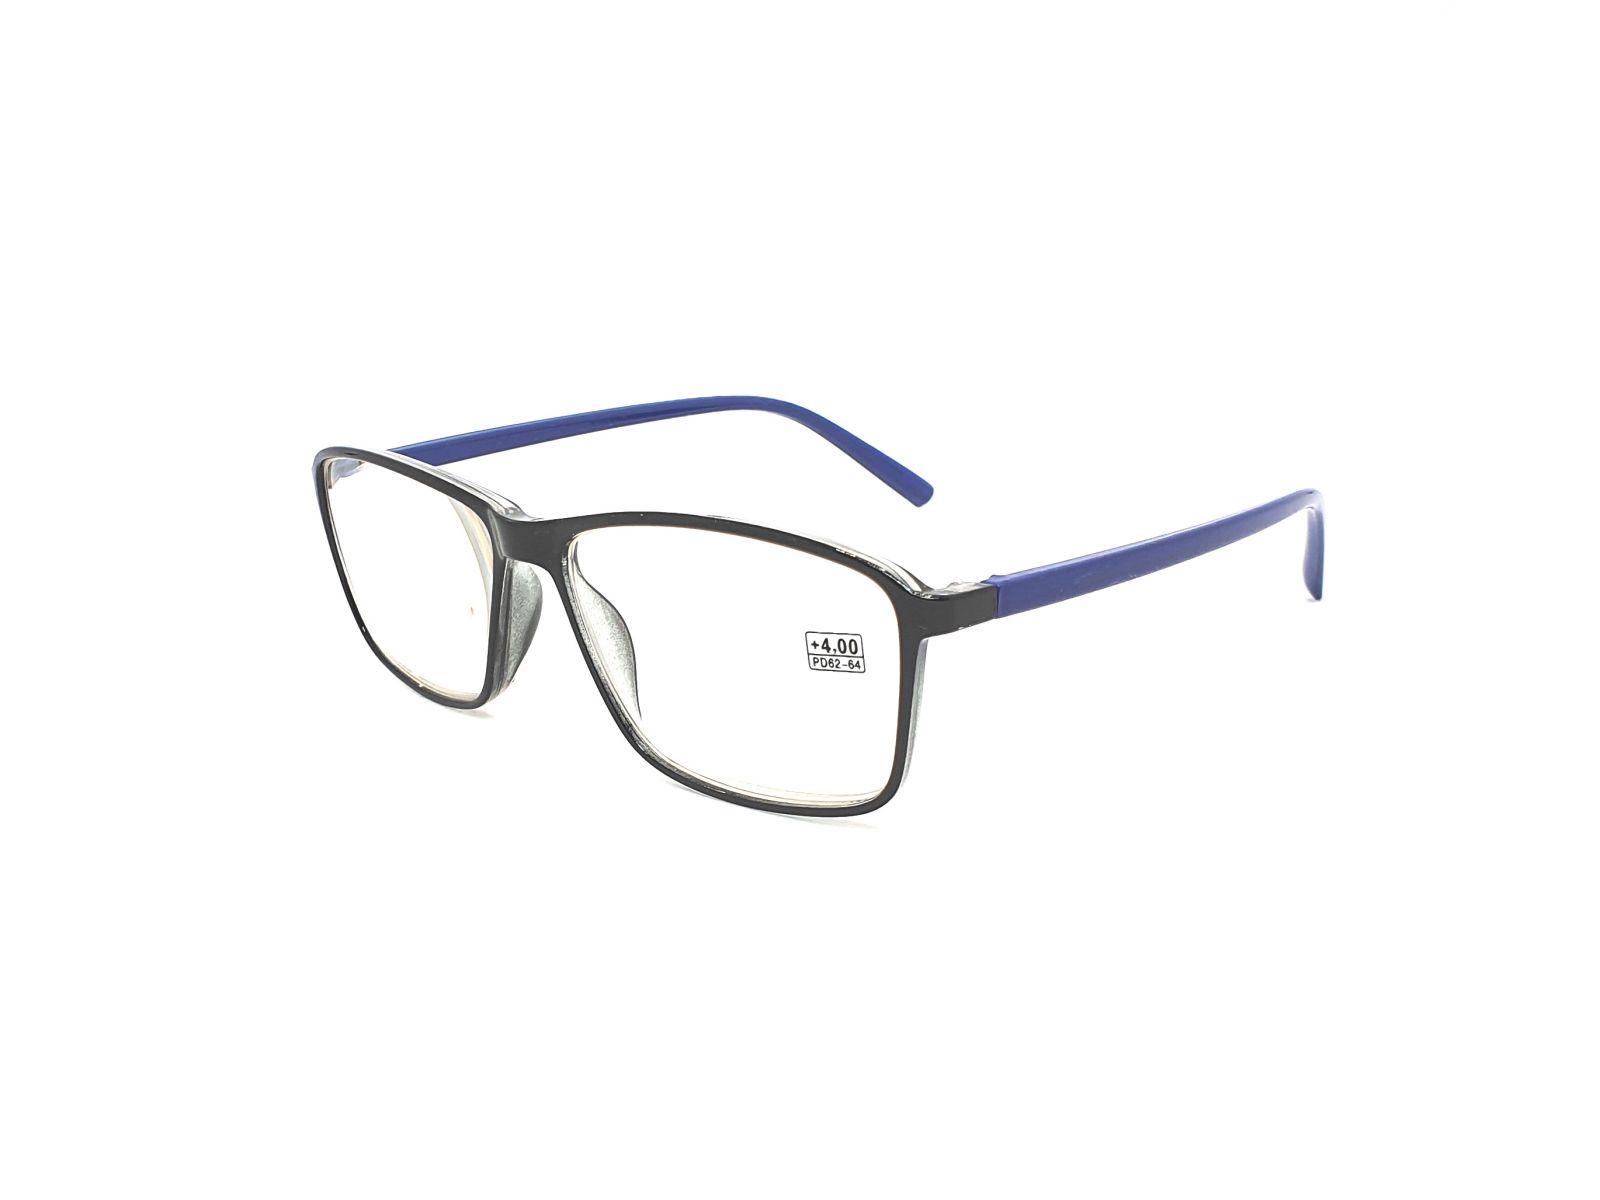 Dioptrické brýle 17218 / +2,50 blue